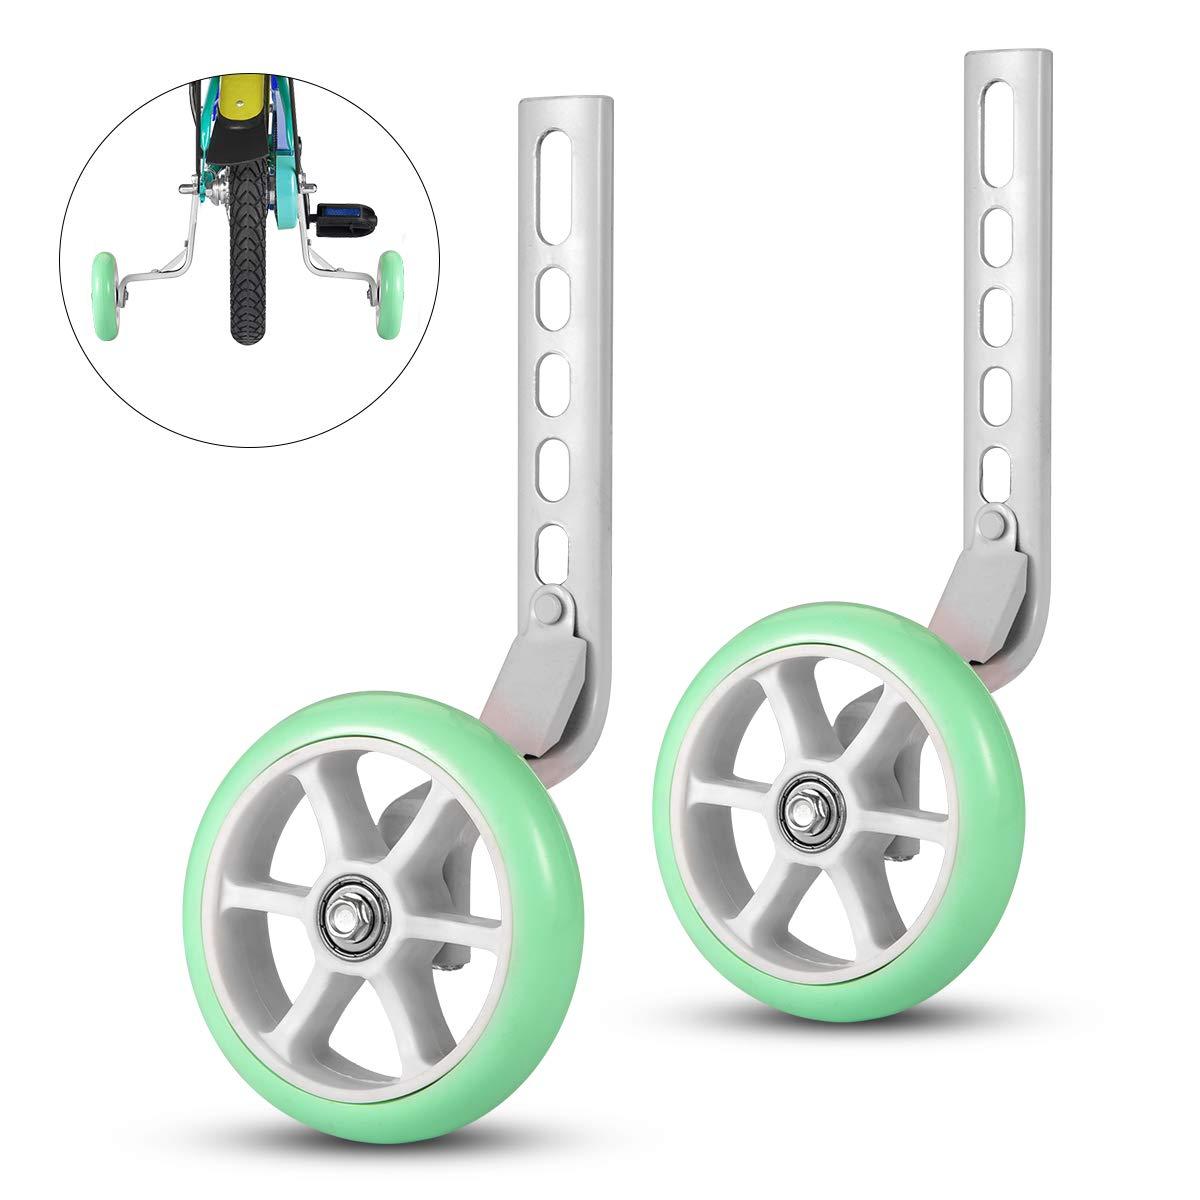 ZOSEN - Ruedas de Entrenamiento para Bicicleta, estabilizador de Bicicleta para niños, Accesorio Esencial para Bicicleta de 12 14 16 18 20 Pulgadas (Verde ...